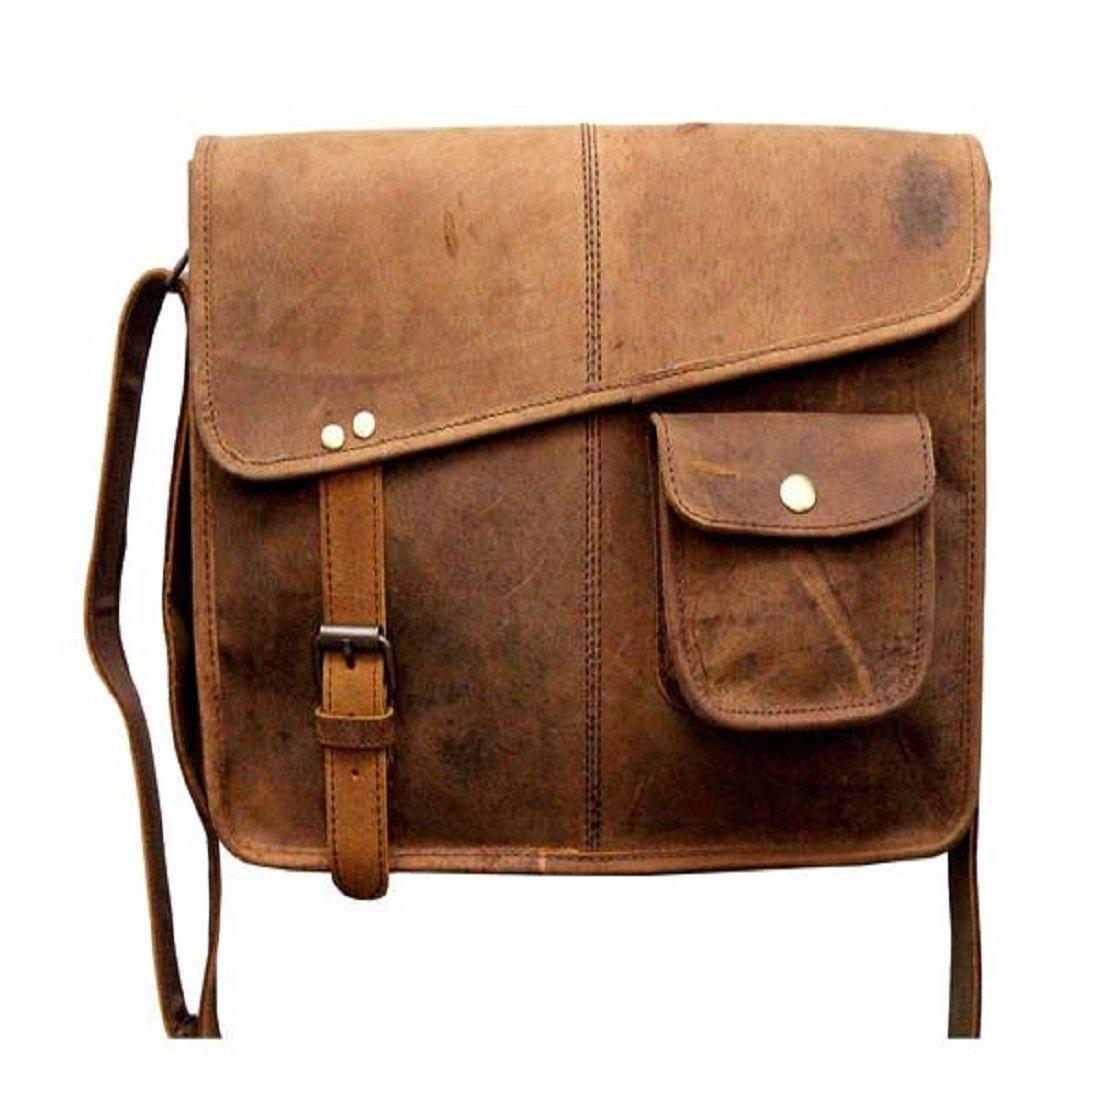 e8d7f441642b TUZECH Designer Buffalo Hunter Leather Bag Laptop Bag - Fits Laptop Upto  13.3 Inches